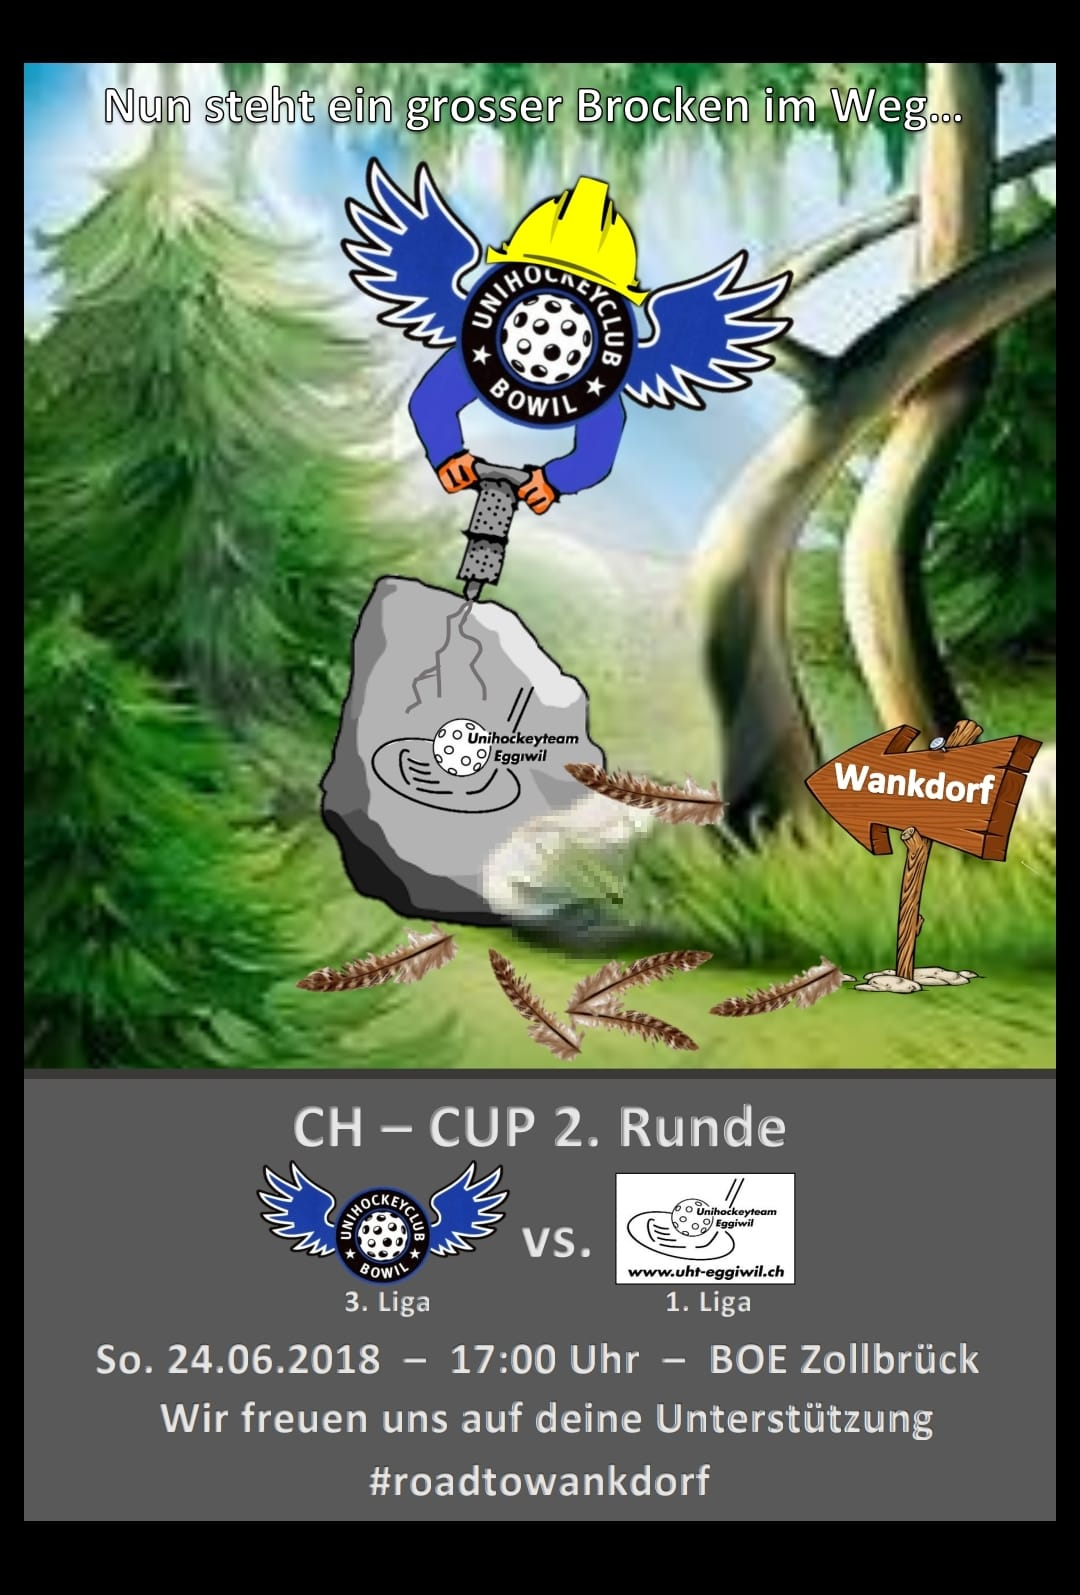 Herren I - CH-Cup 2.Runde UHC Bowil Saison 2018/19